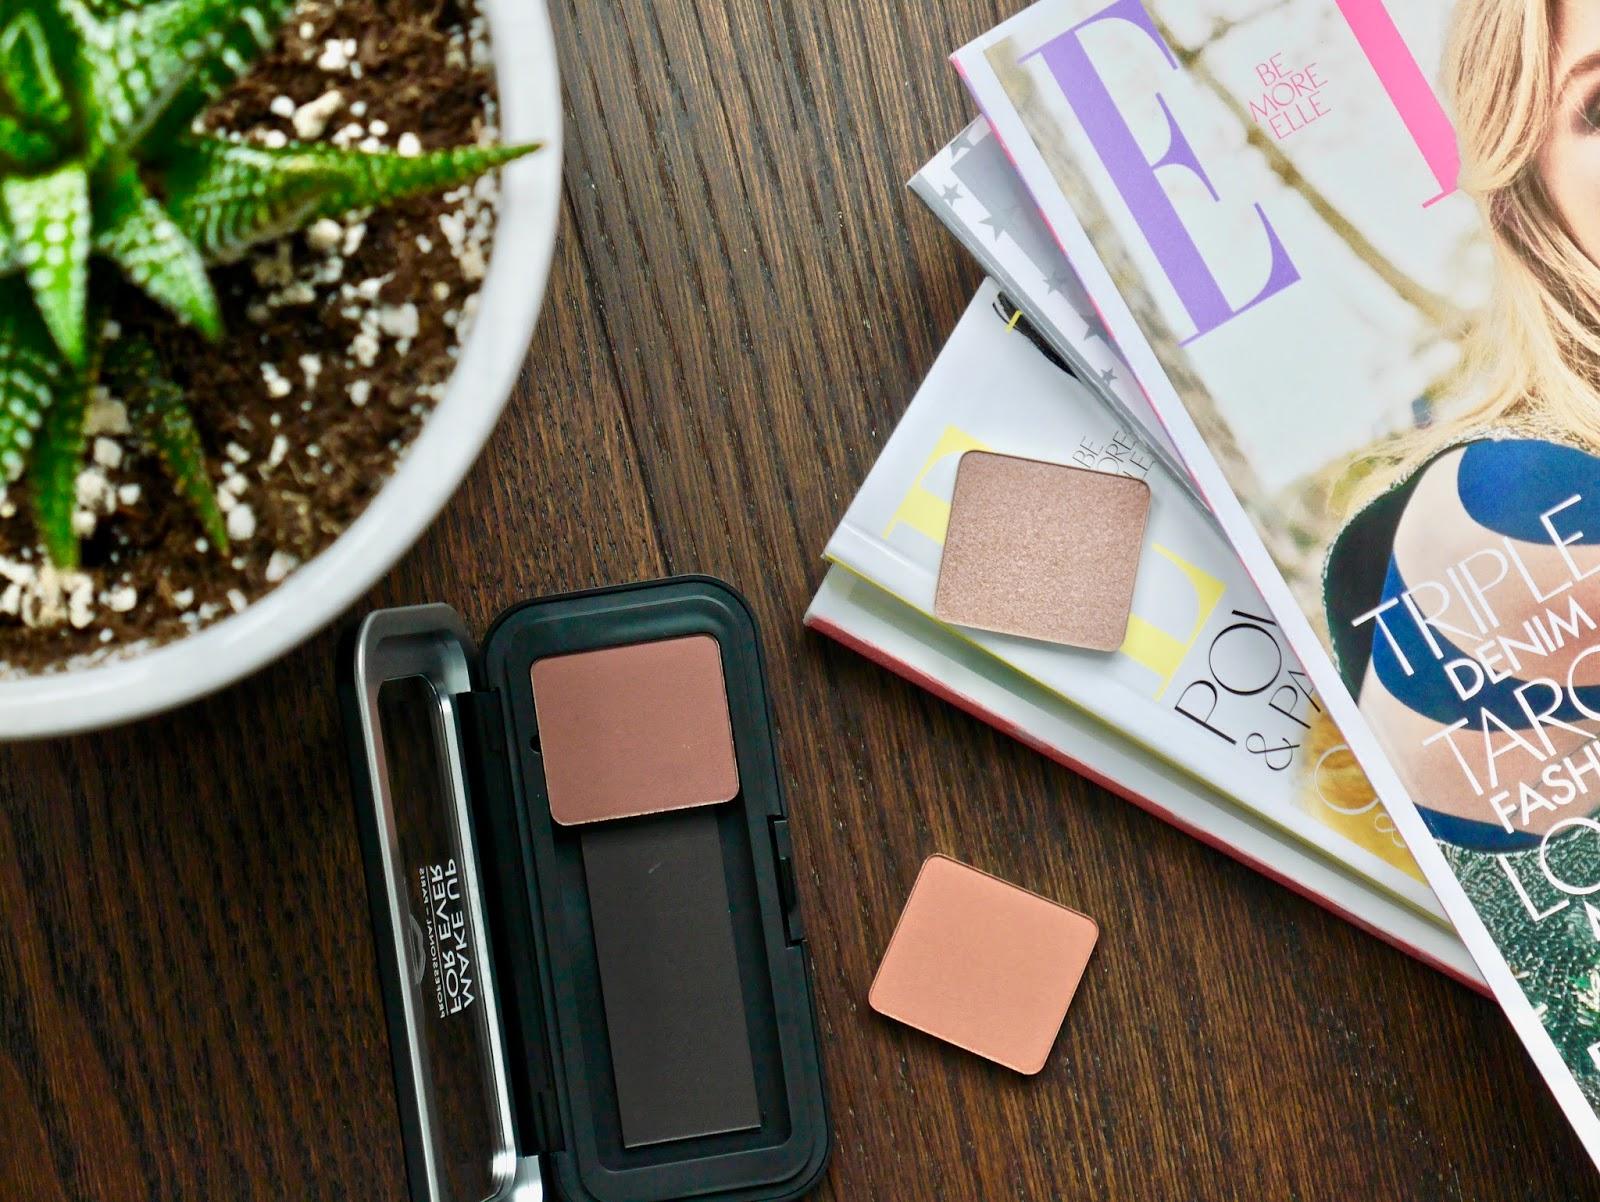 makeup, eyeshadows, Sephora, beauty, Canadian beauty